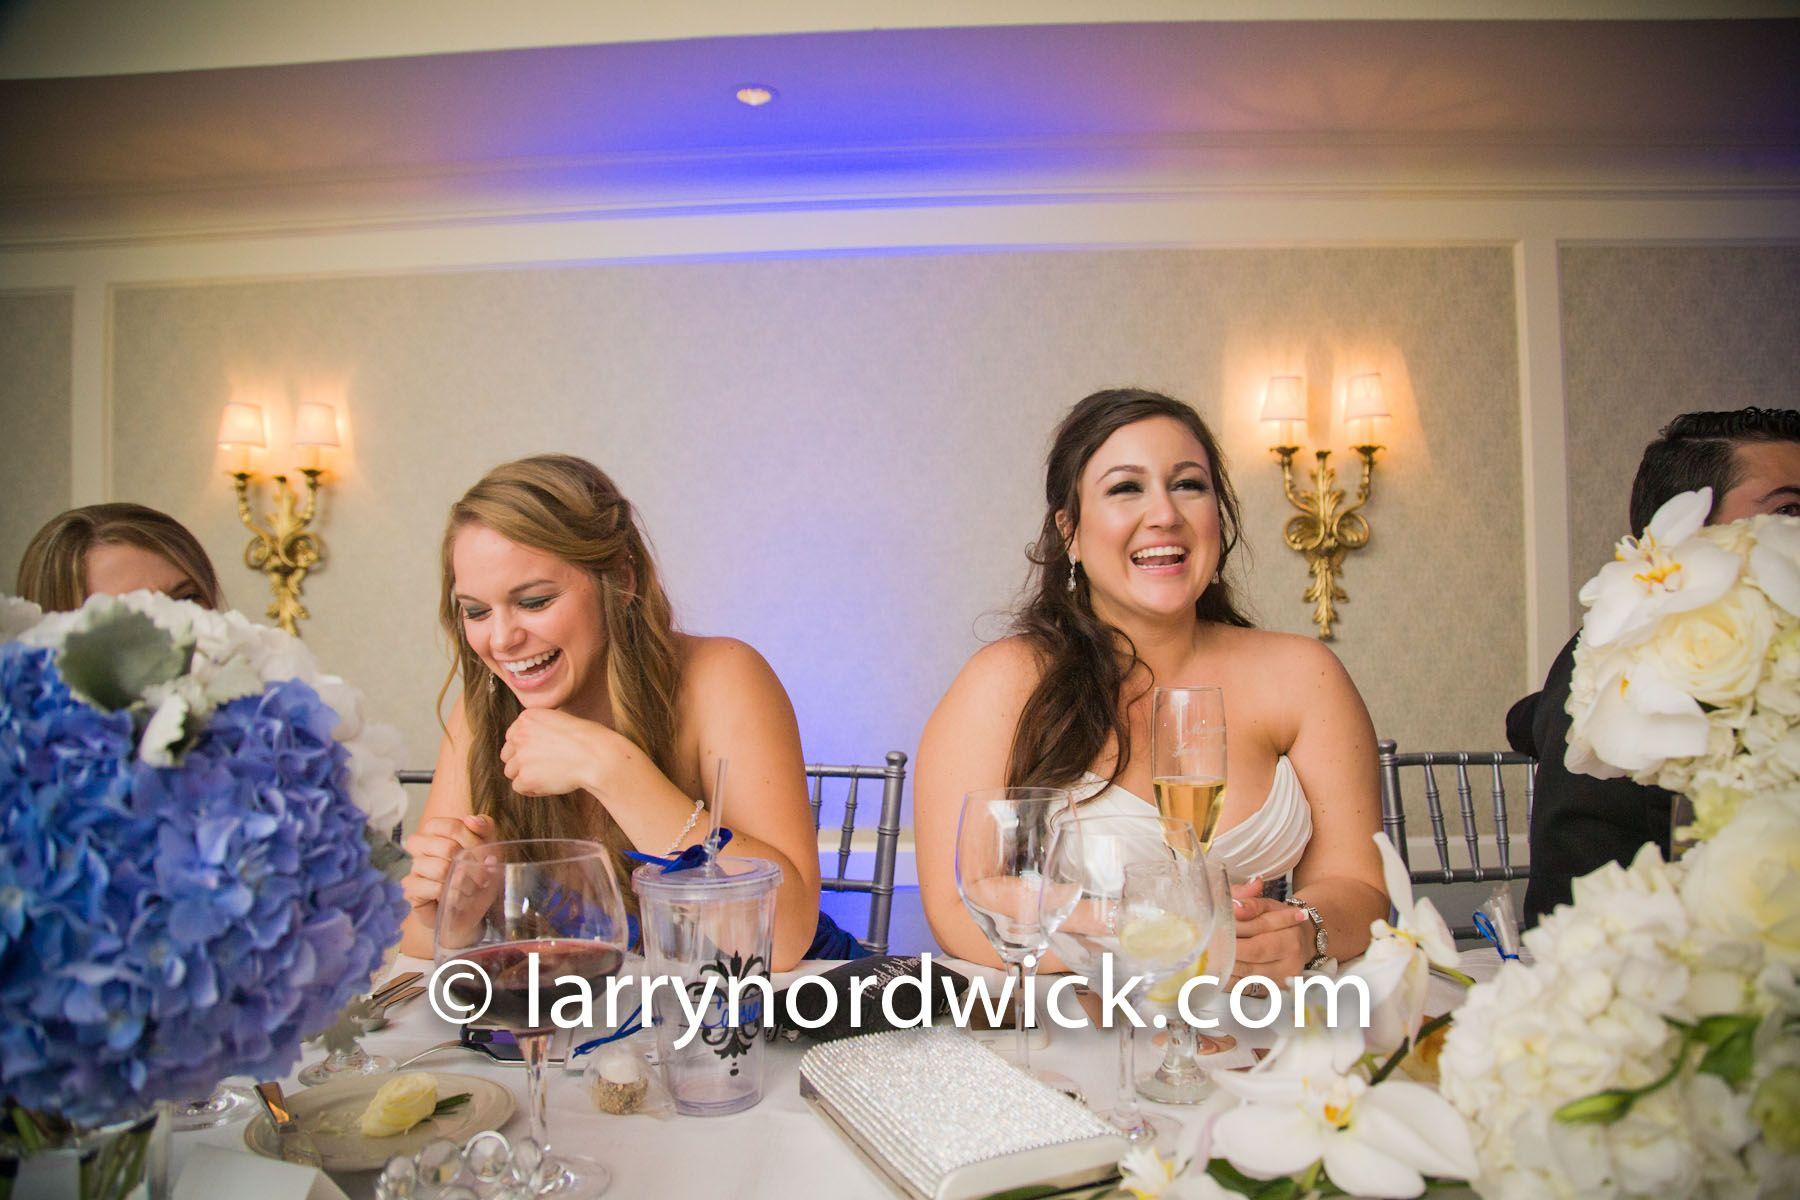 Monterey Plaza Hotel Wedding | Dolphin's Ballroom | Creative Images Photography Larry Nordwick